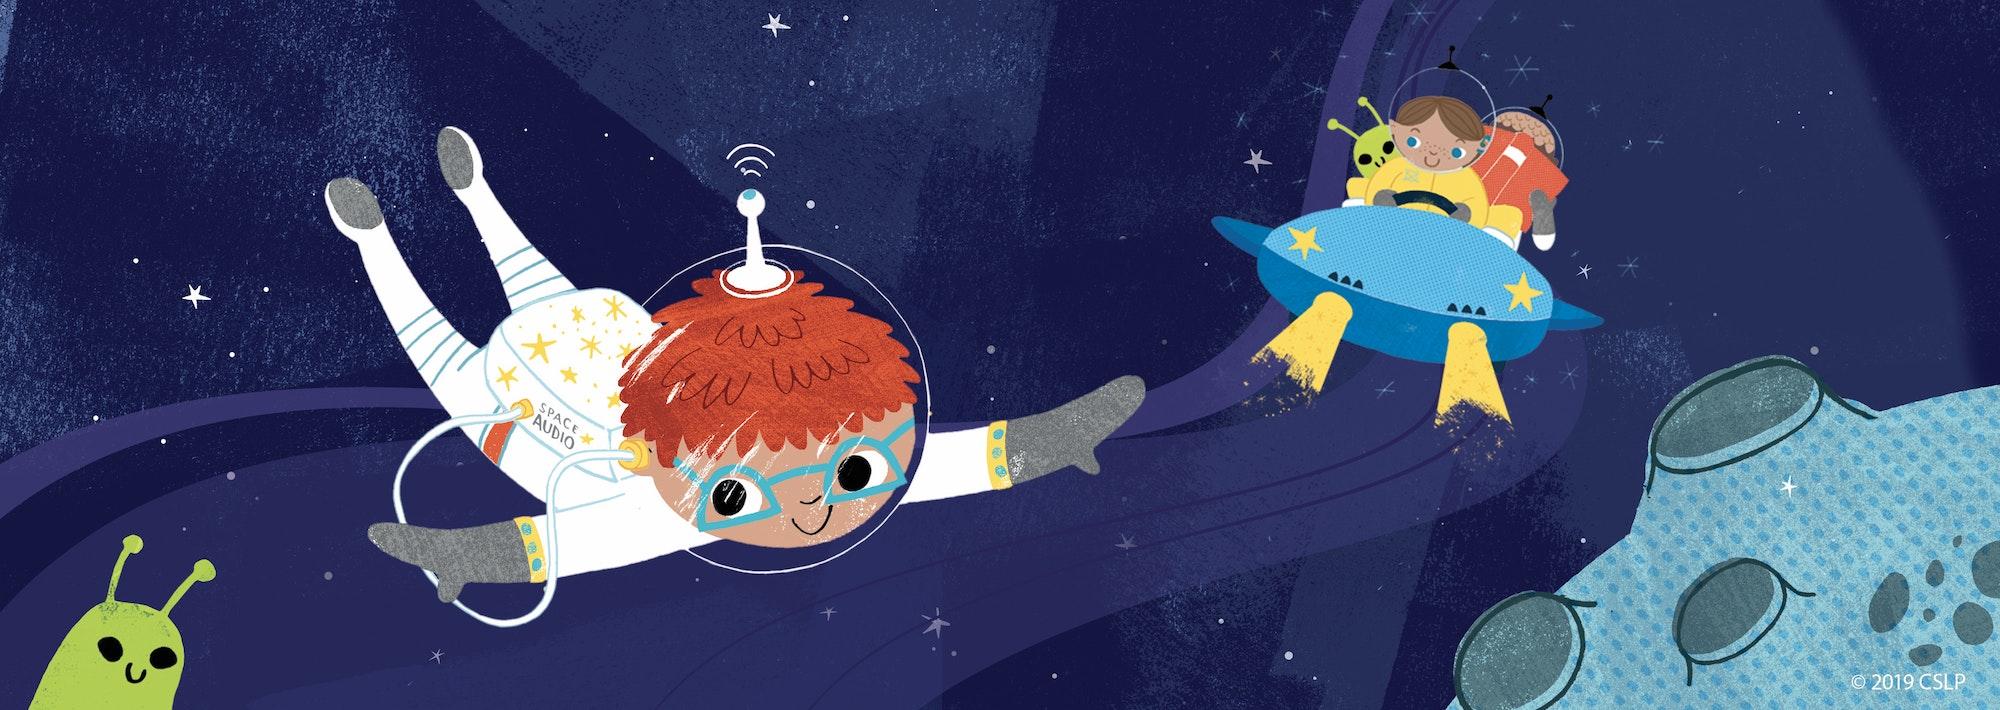 picture child astronauts, aliens and spaceship cartoon